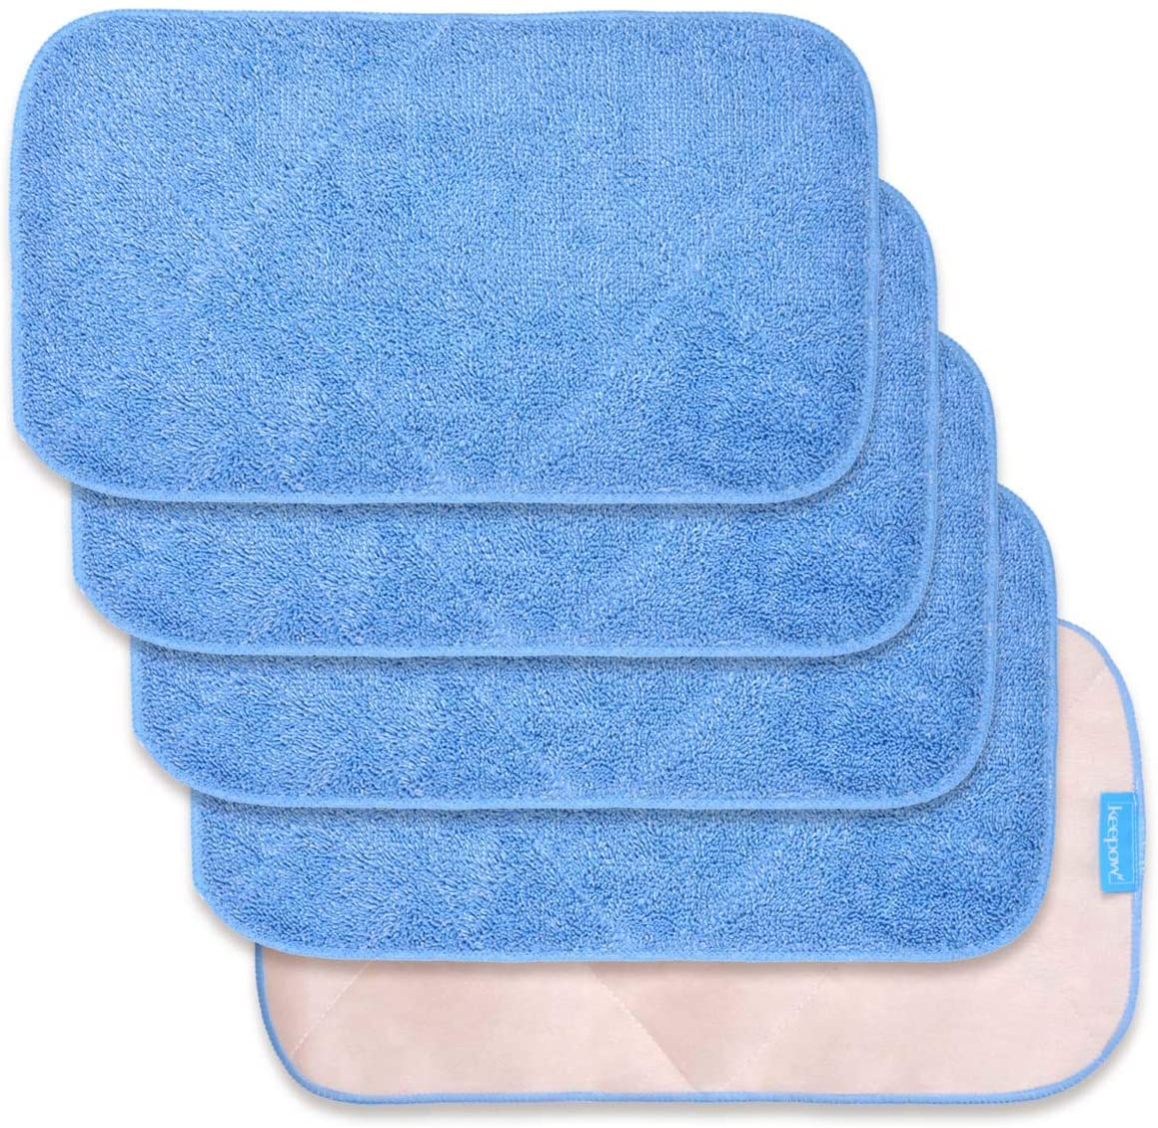 KEEPOW Microfiber Mop Cloth Refills online shop MR. Fees free Professional Mi for SIGA